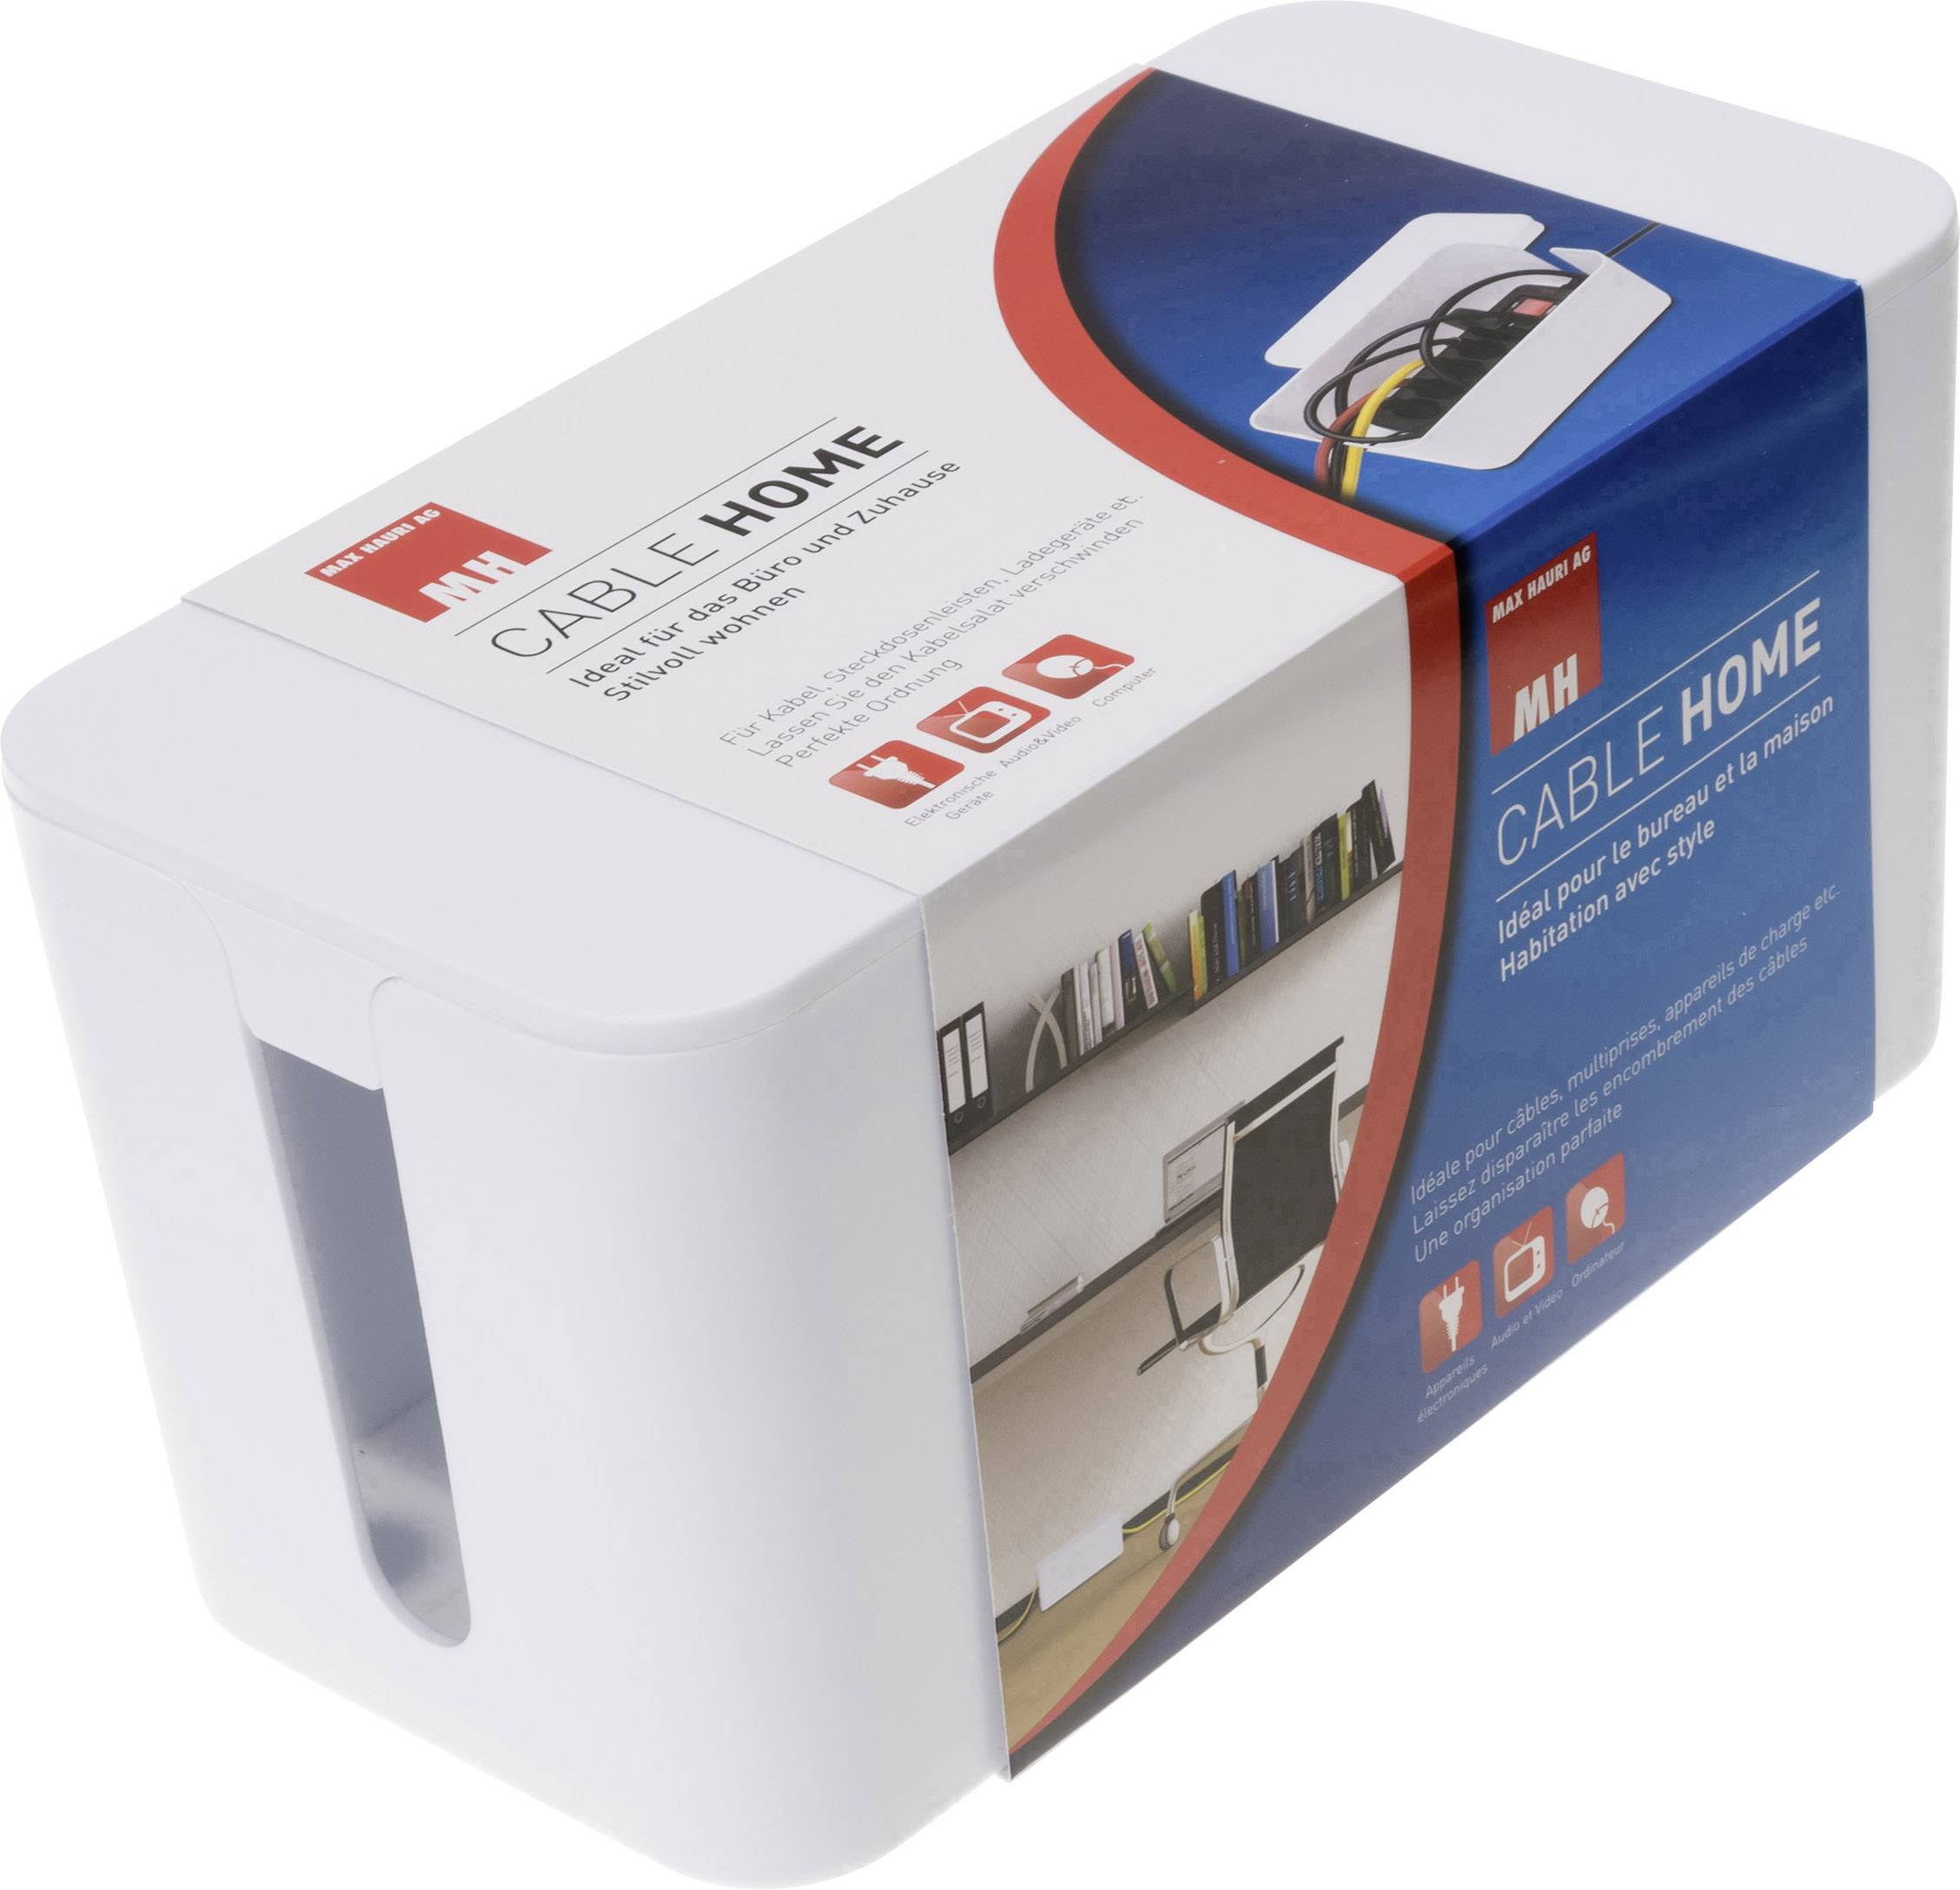 Max Hauri AG Kabel-Box Weiß (L x B x H) 235 x 115 x 120 mm 1 St. 126731